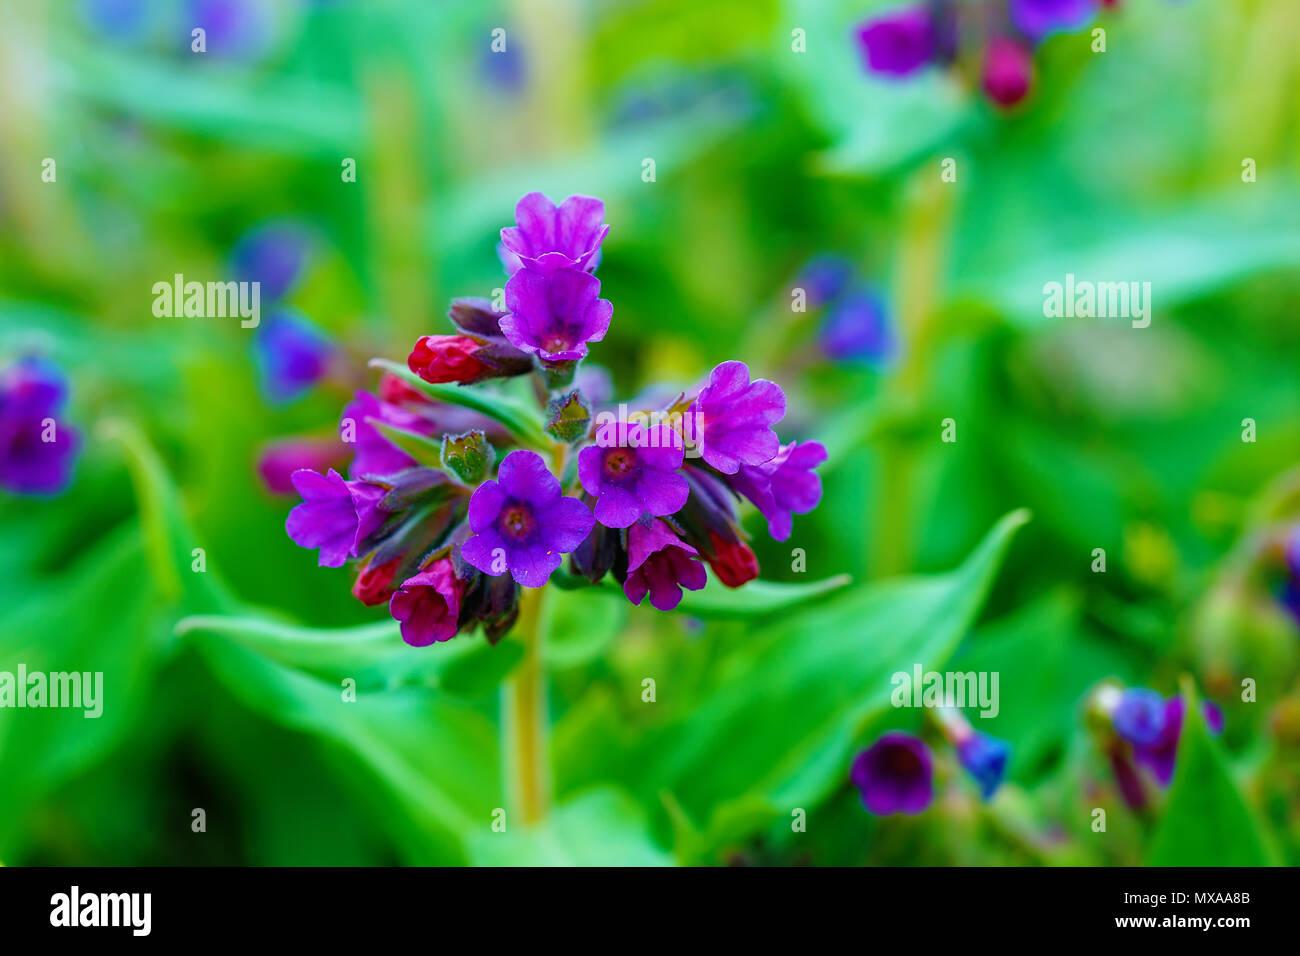 closeup detail of meadow flower - wild healing herb - Pulmonaria mollis. - Stock Image